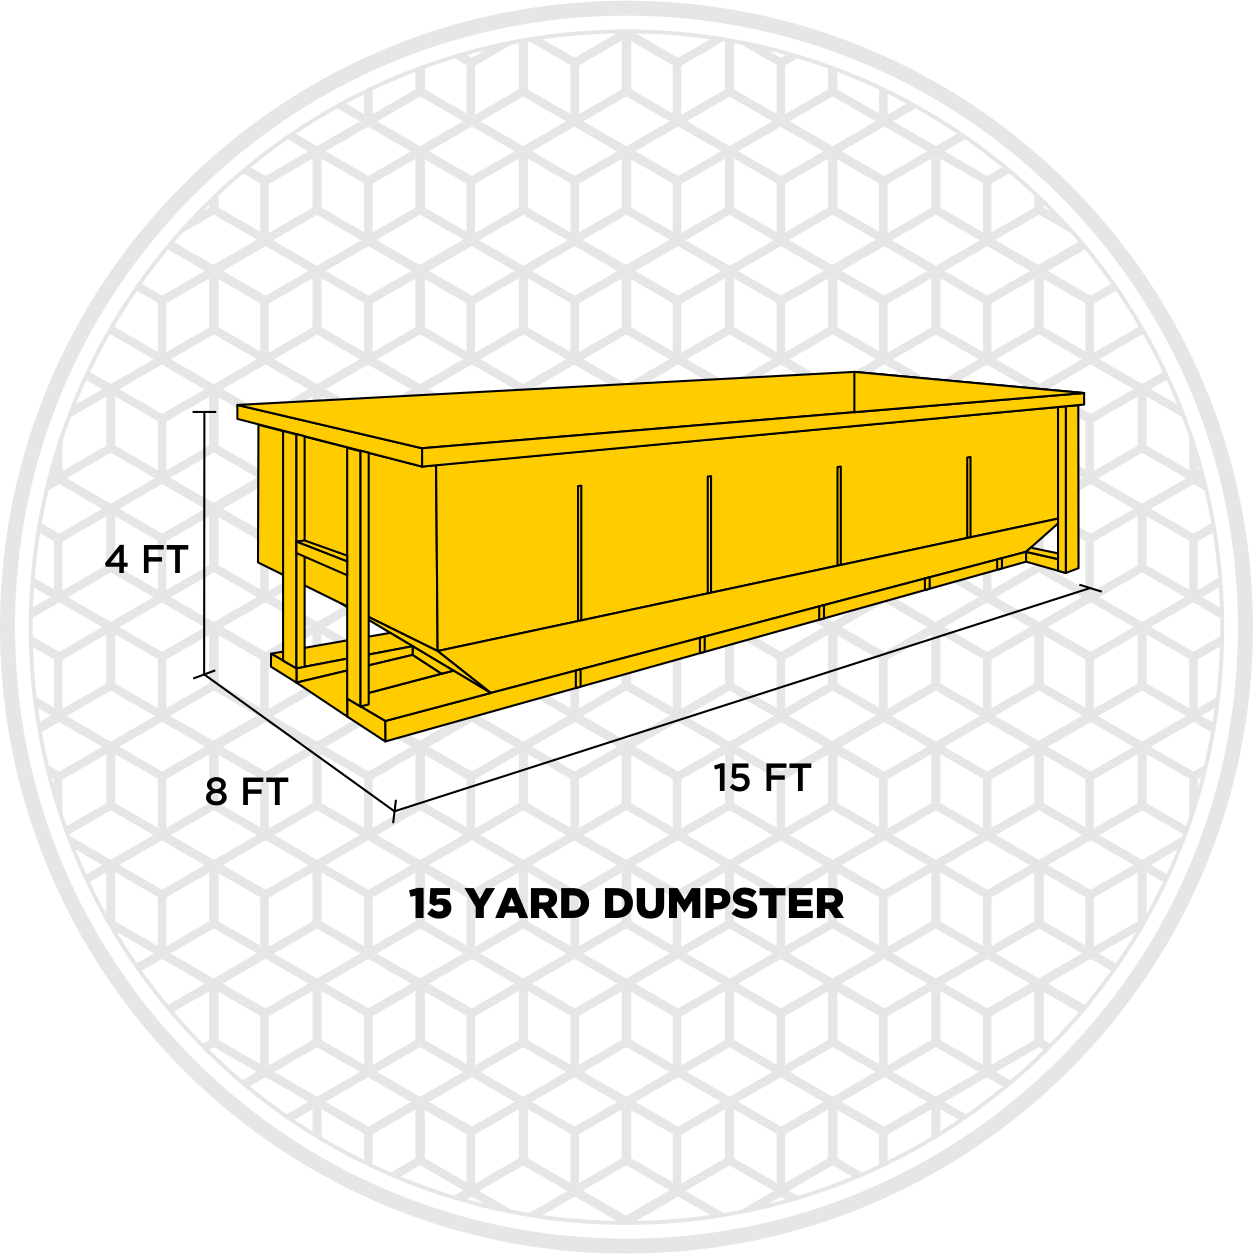 15 yard dumpster rental size